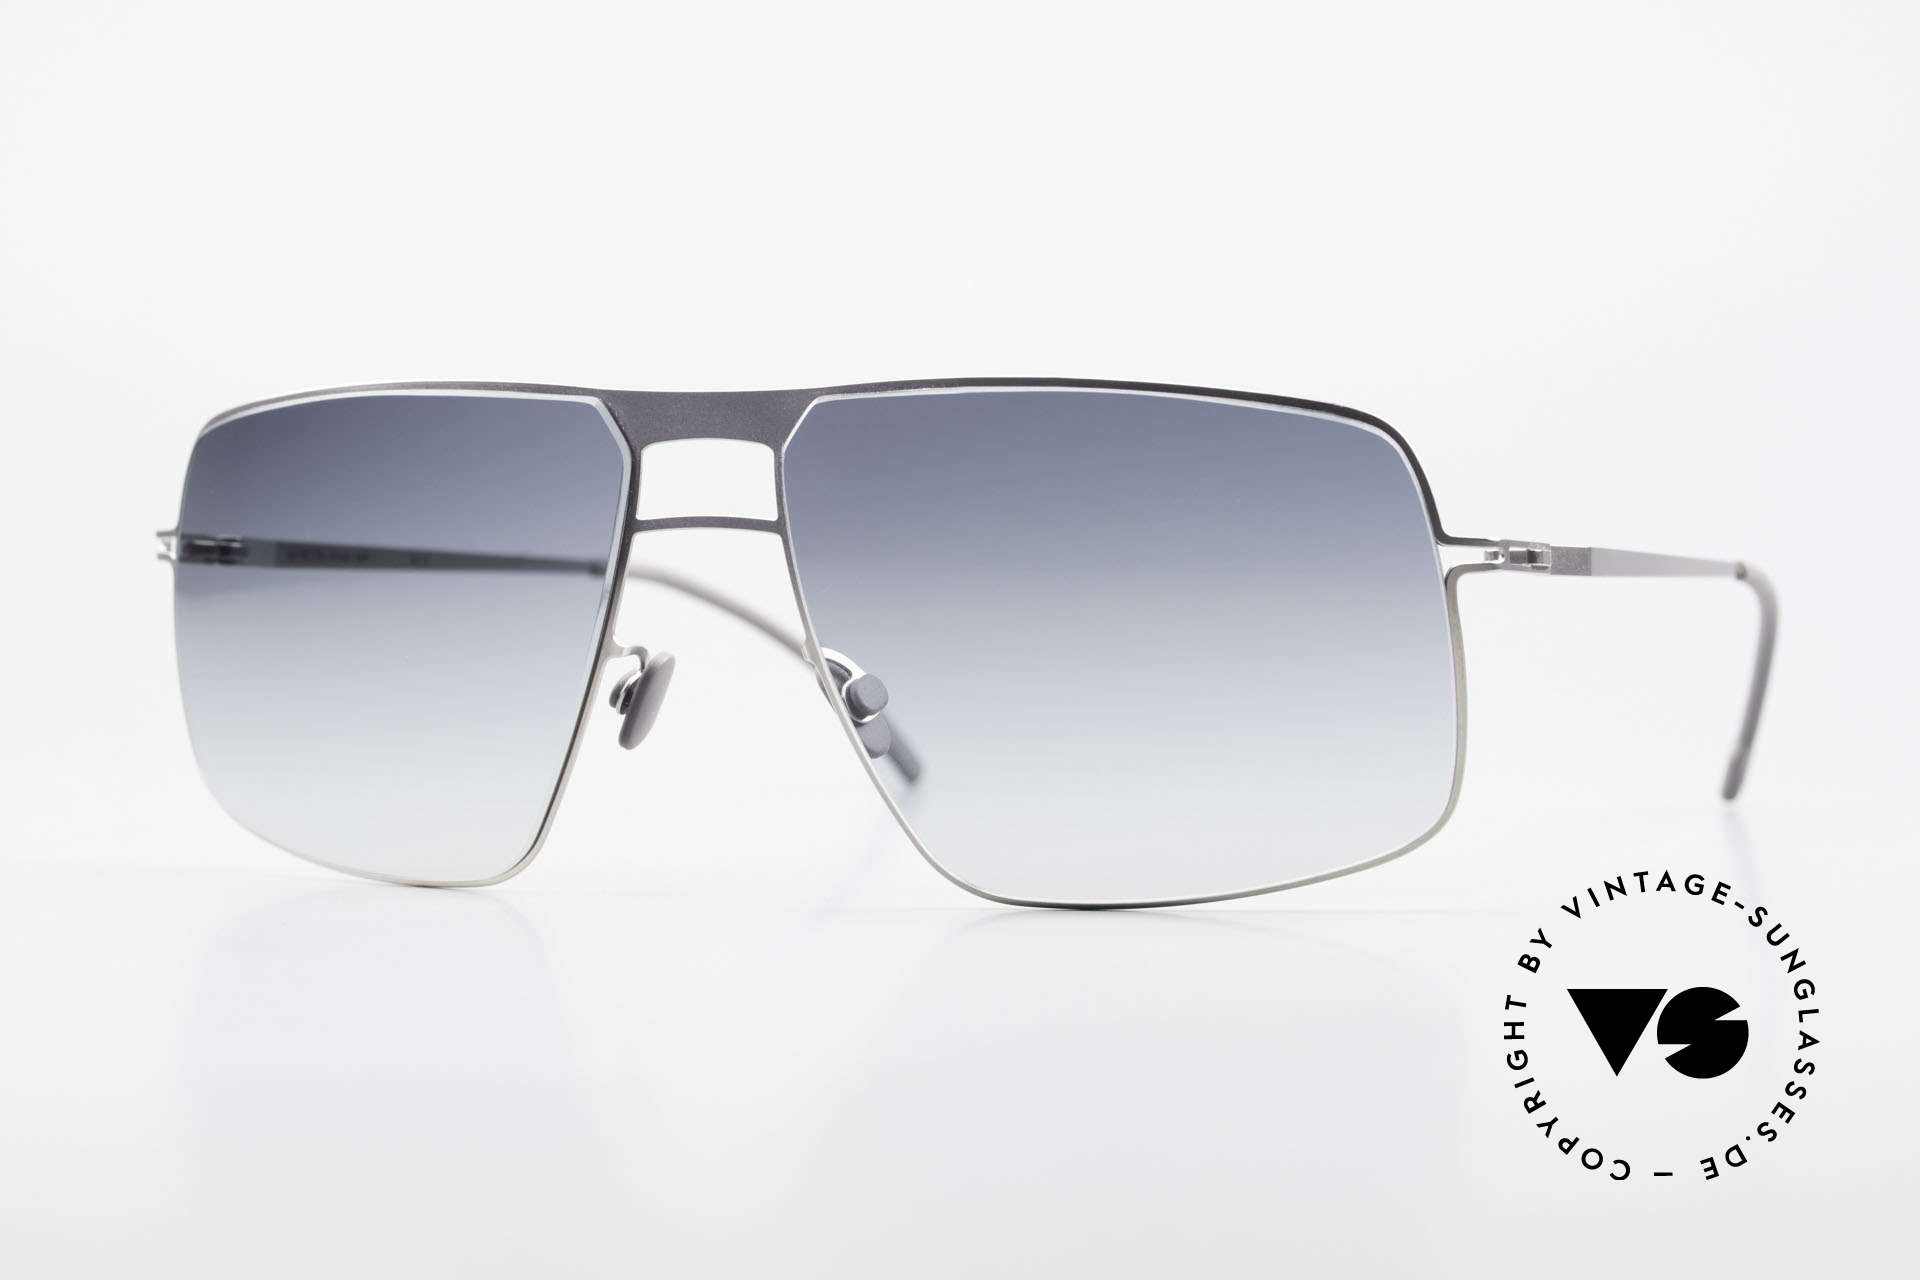 Mykita Leif Designer Men's Sunglasses 2011, original VINTAGE MYKITA men's sunglasses from 2011, Made for Men